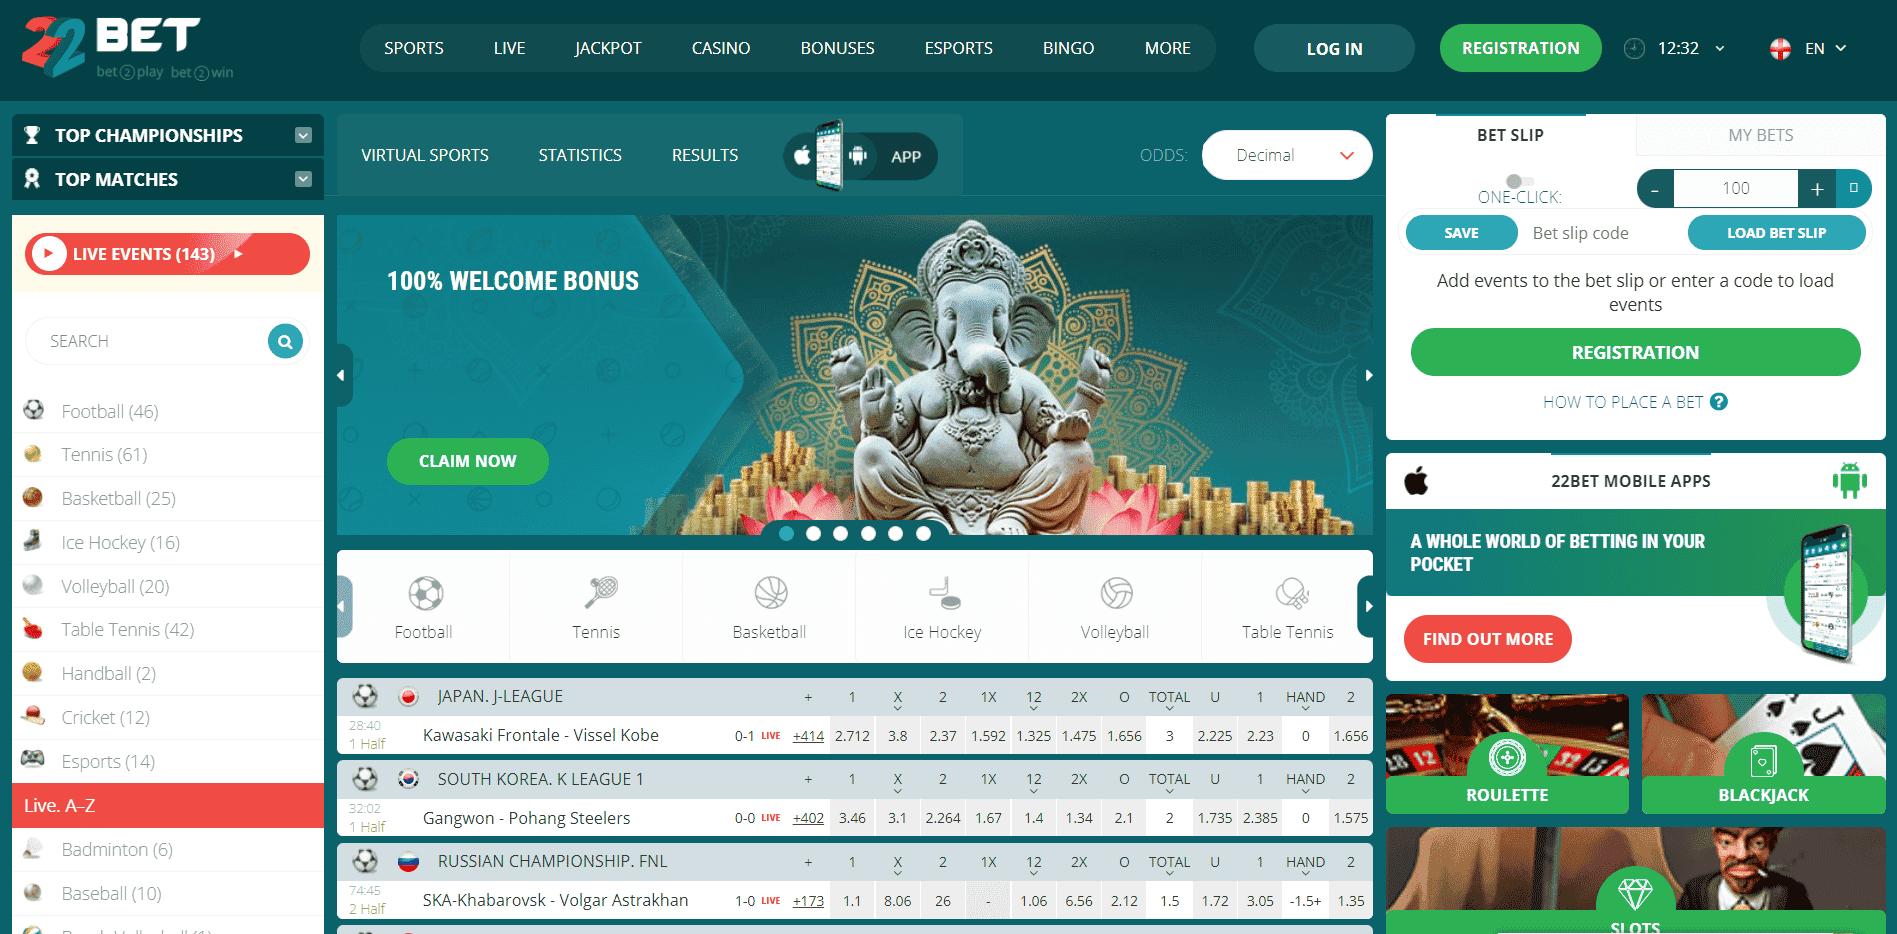 horse racing betting - 22bet